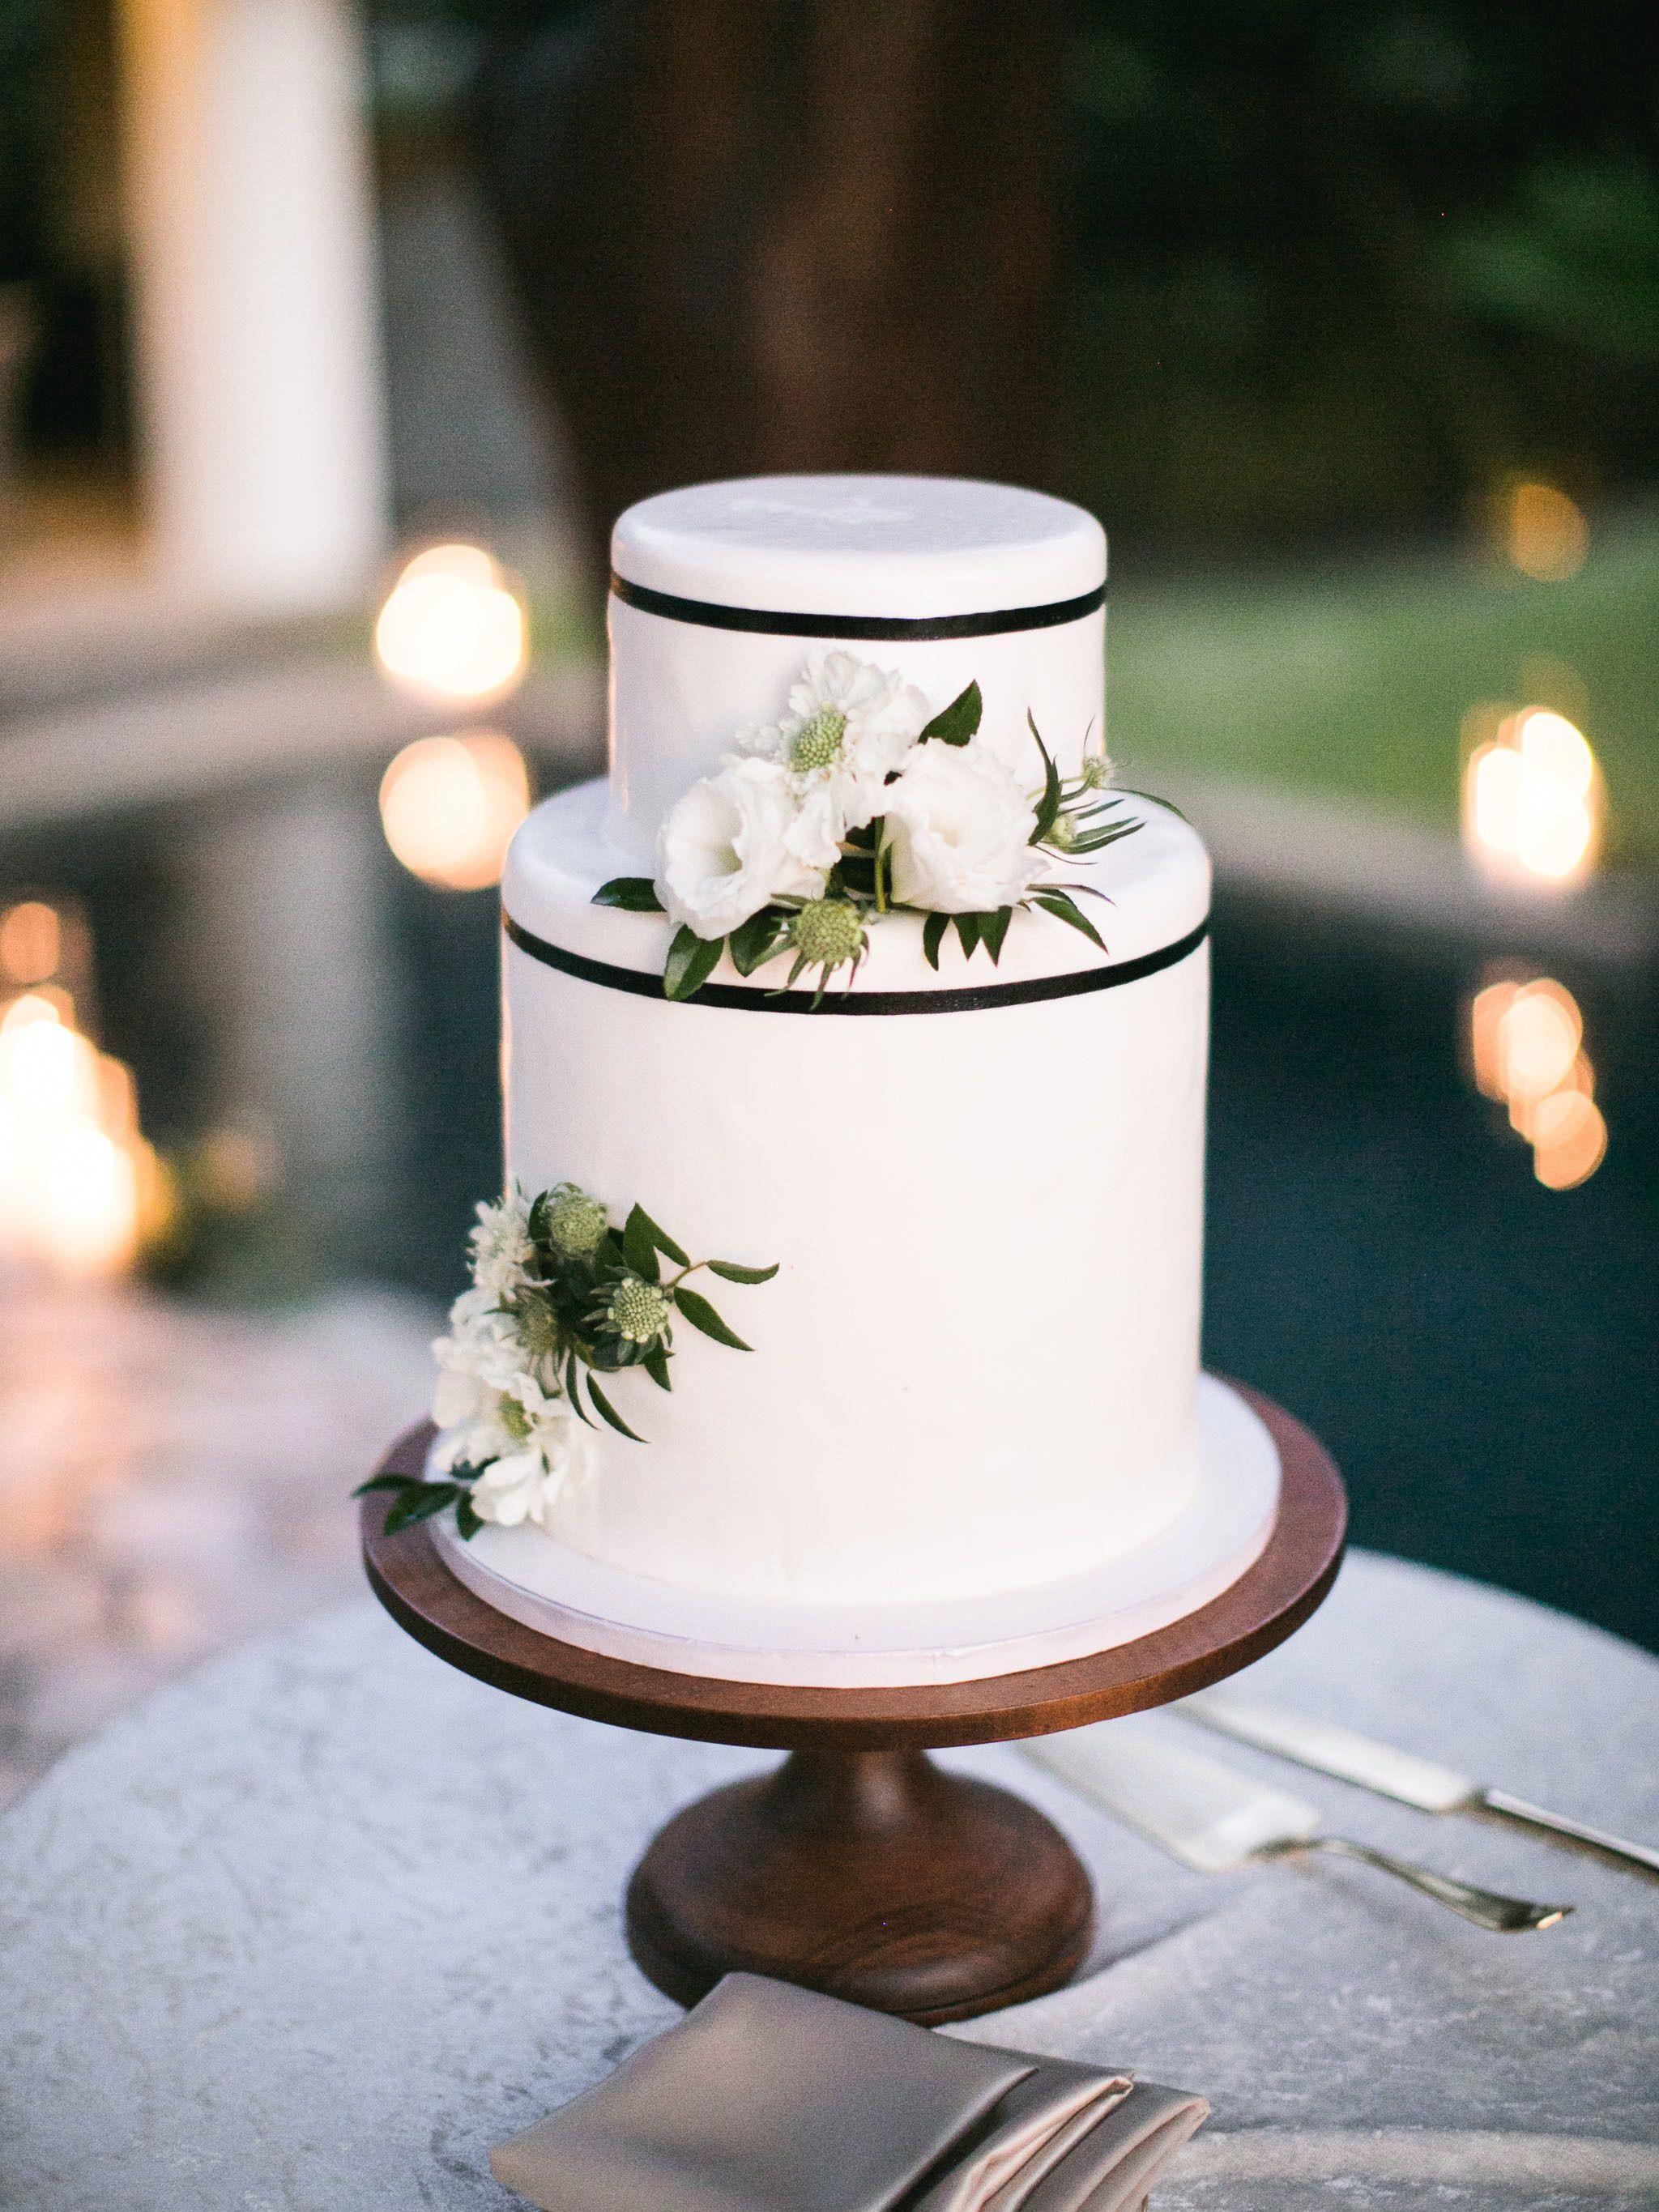 Simple Wedding Cake Decorating Ideas Floral Wedding Cakes